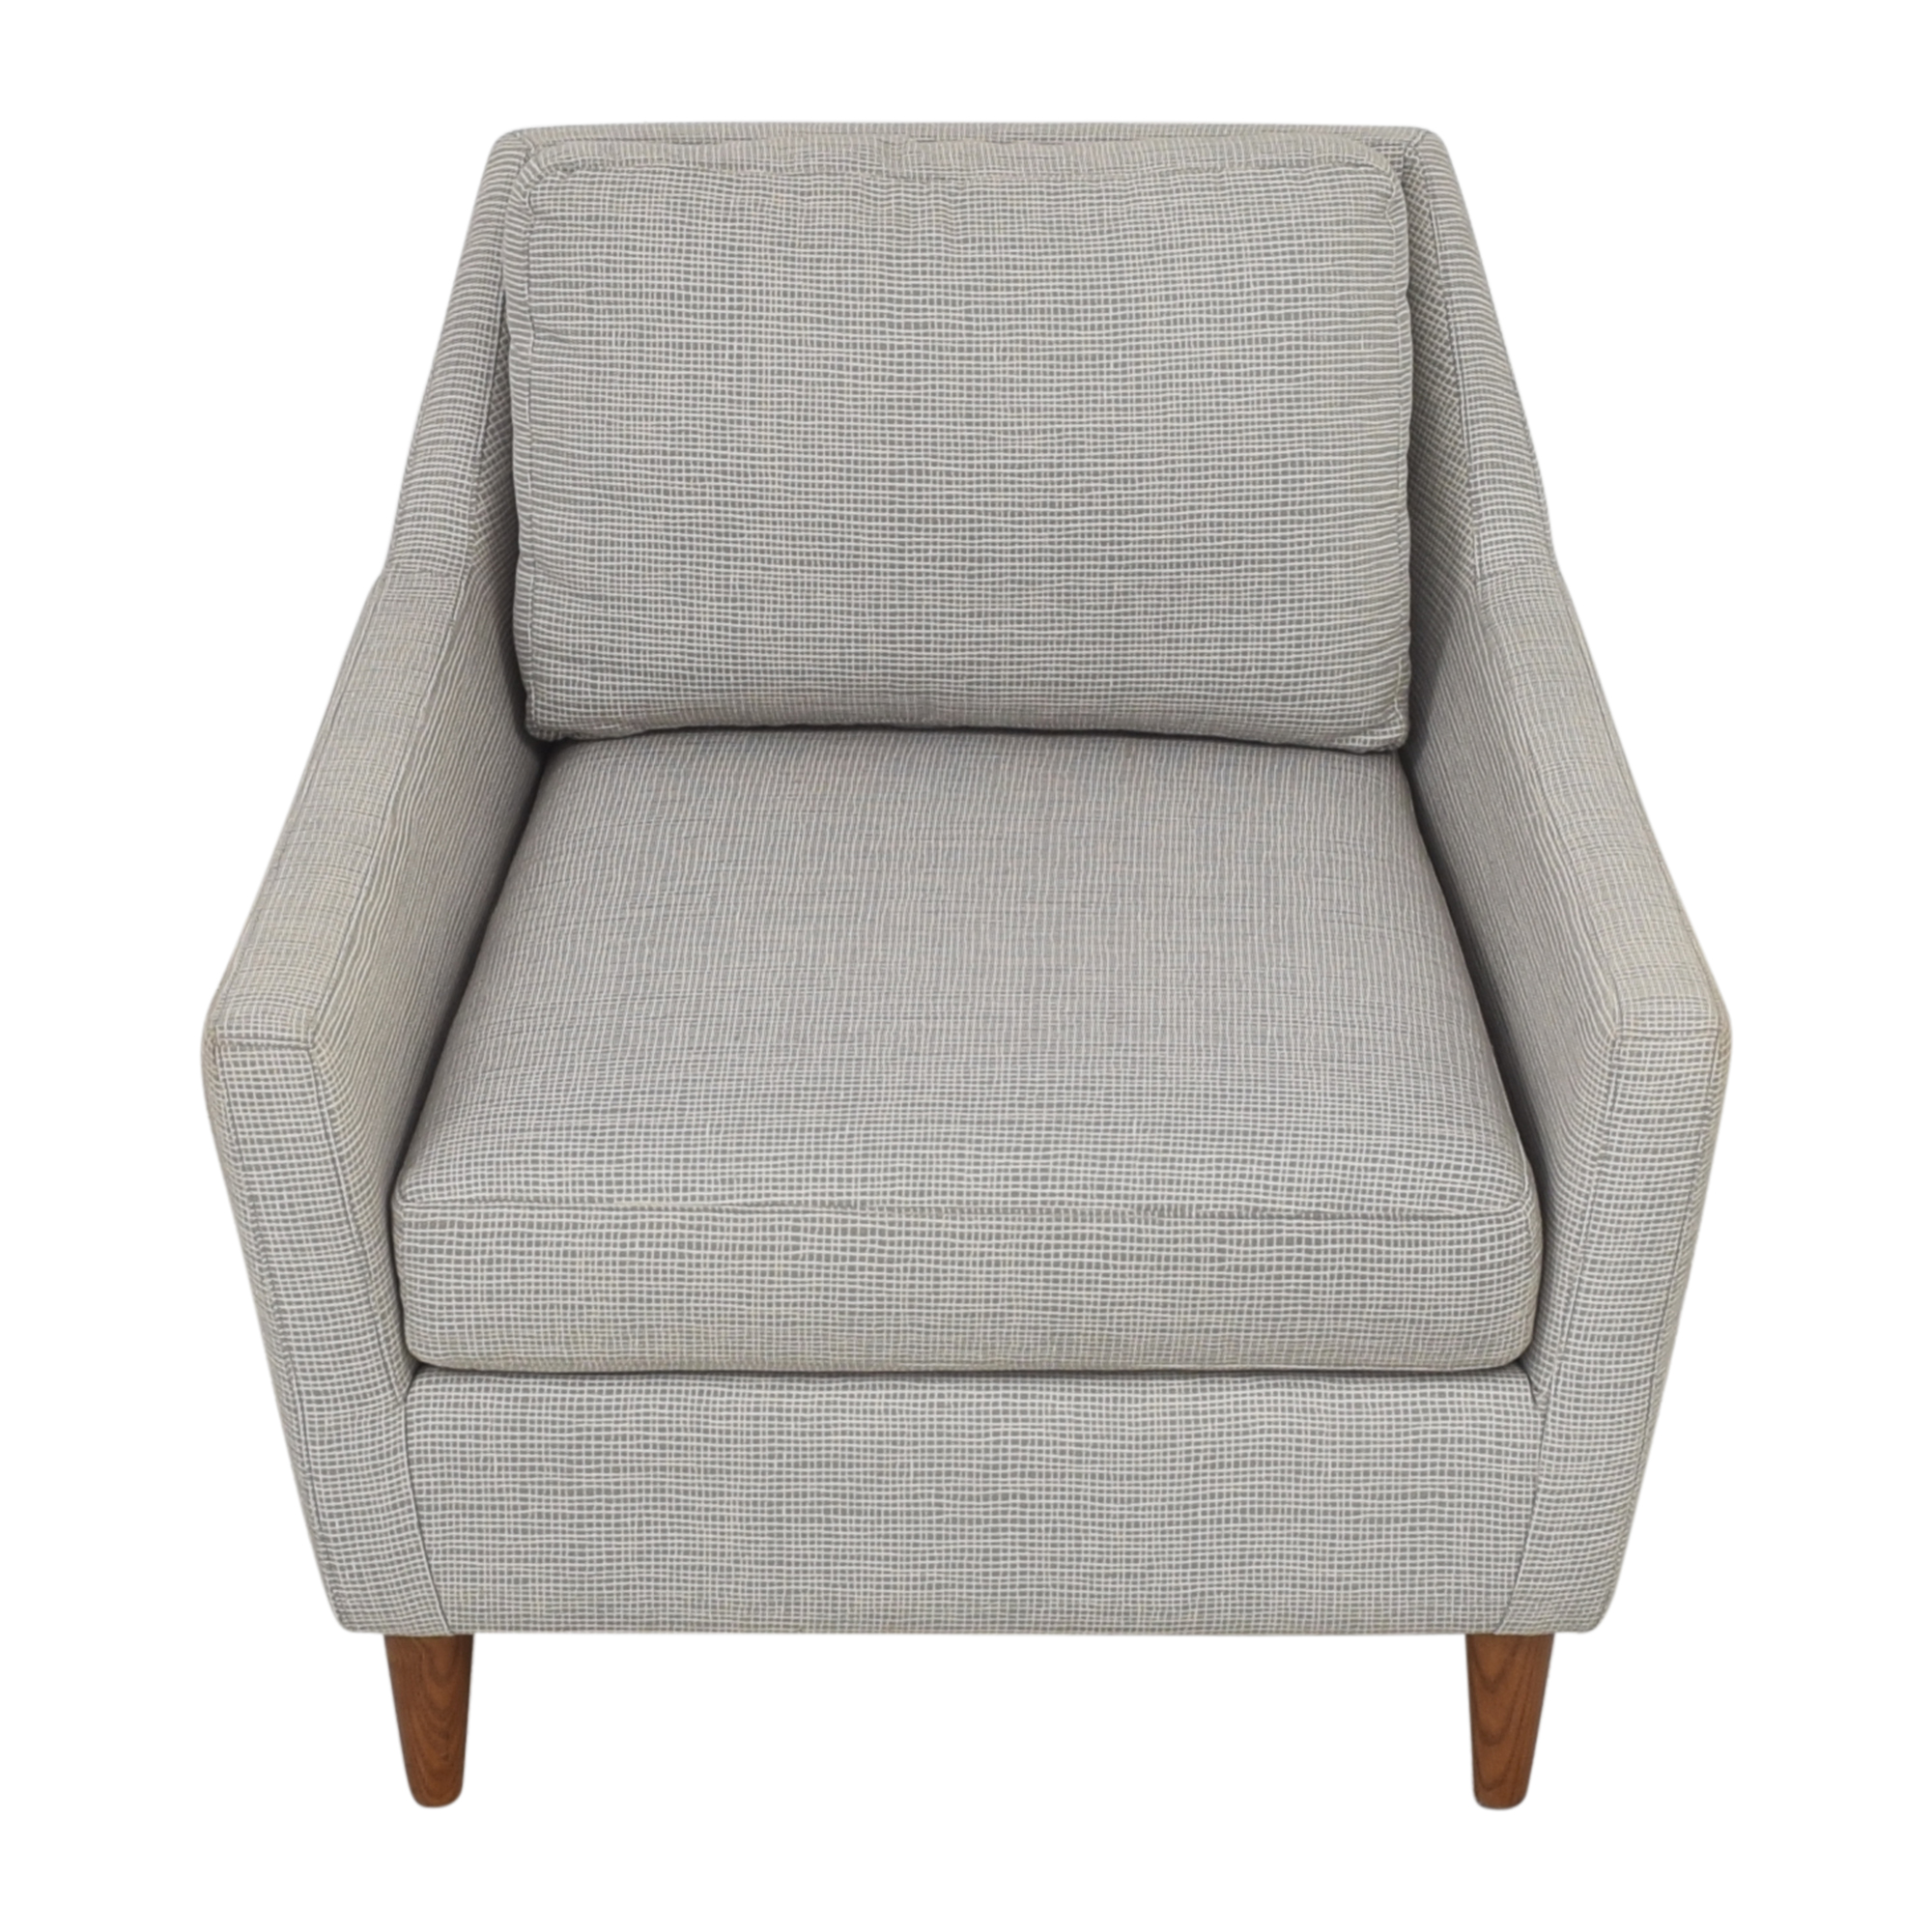 West Elm West Elm Accent Chair ma